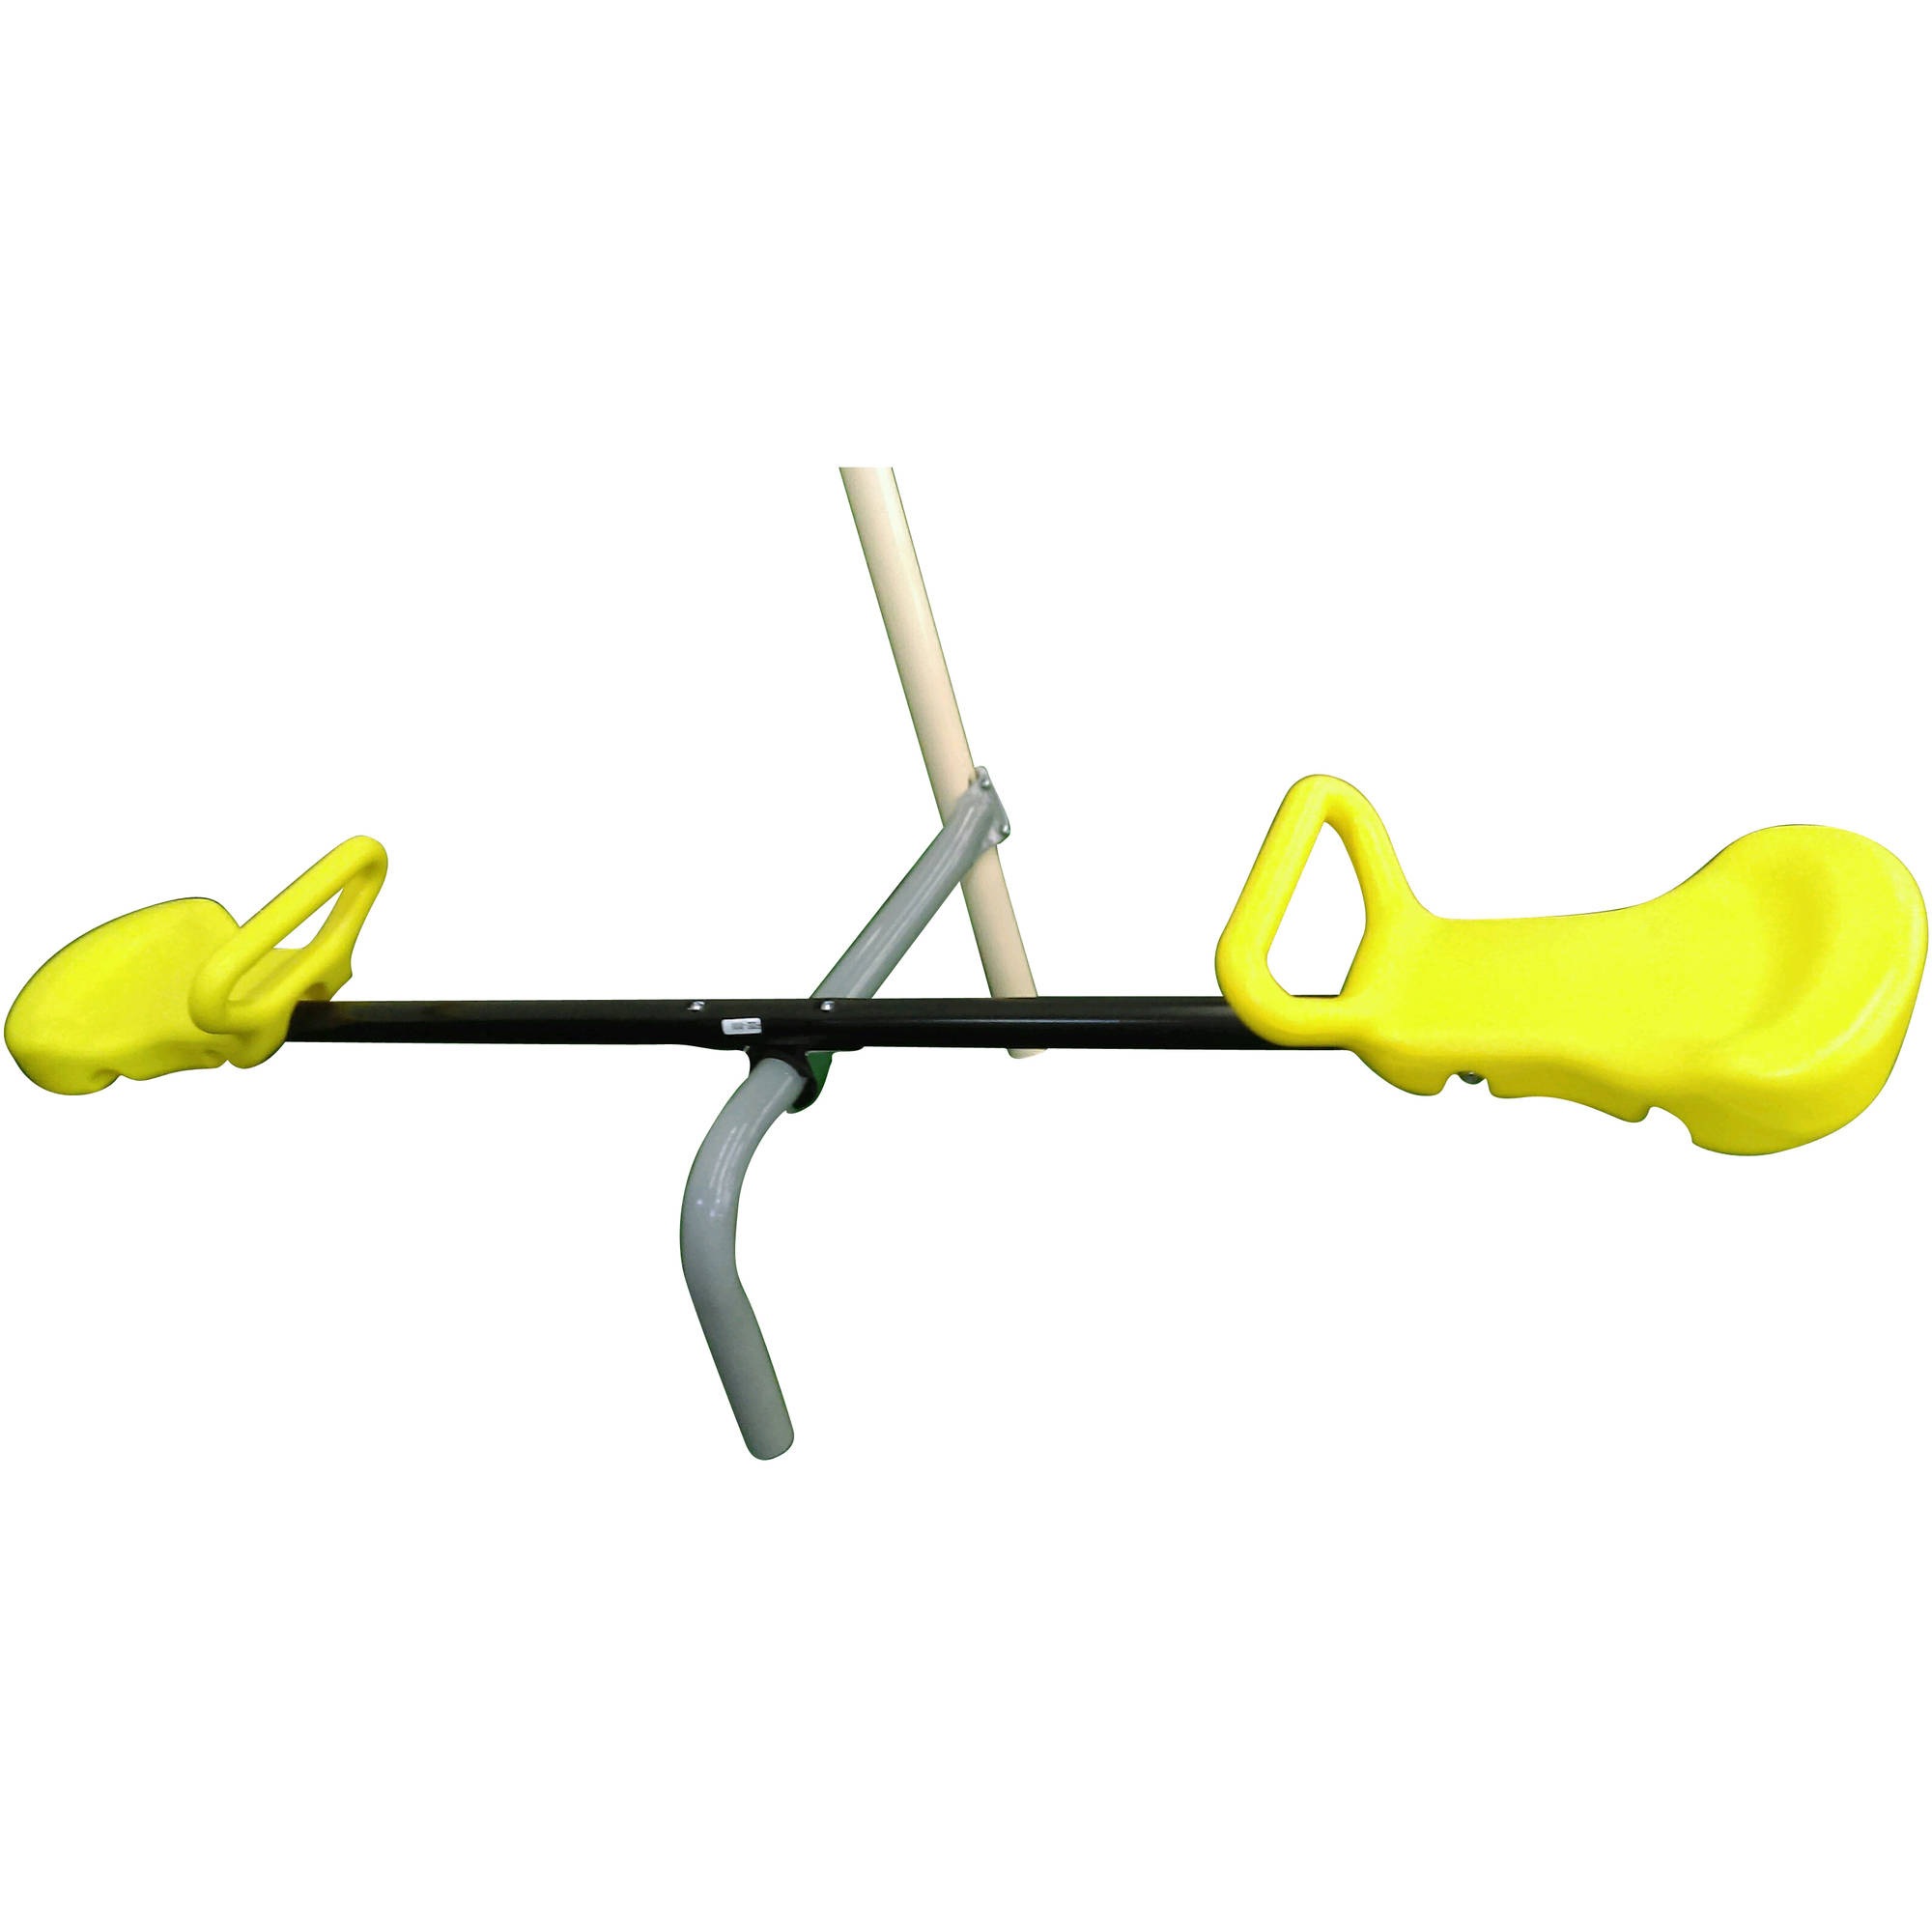 Flexible Flyer Add On Seesaw For Swing Set Grey Black Yellow